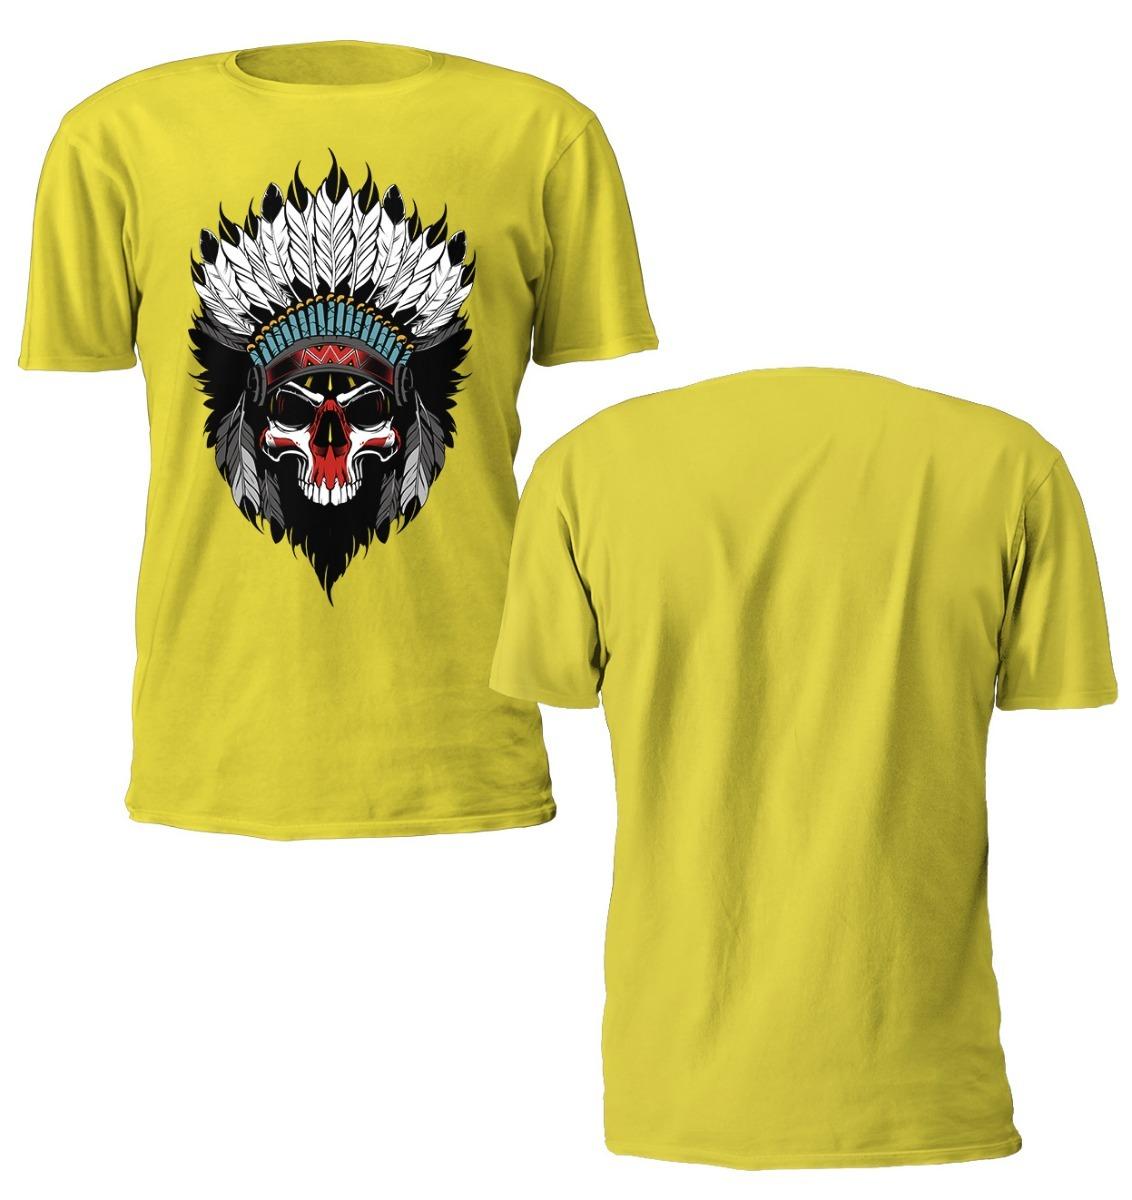 59ced6f31 camiseta masculina skull caveira cocar indio manga curta. Carregando zoom.